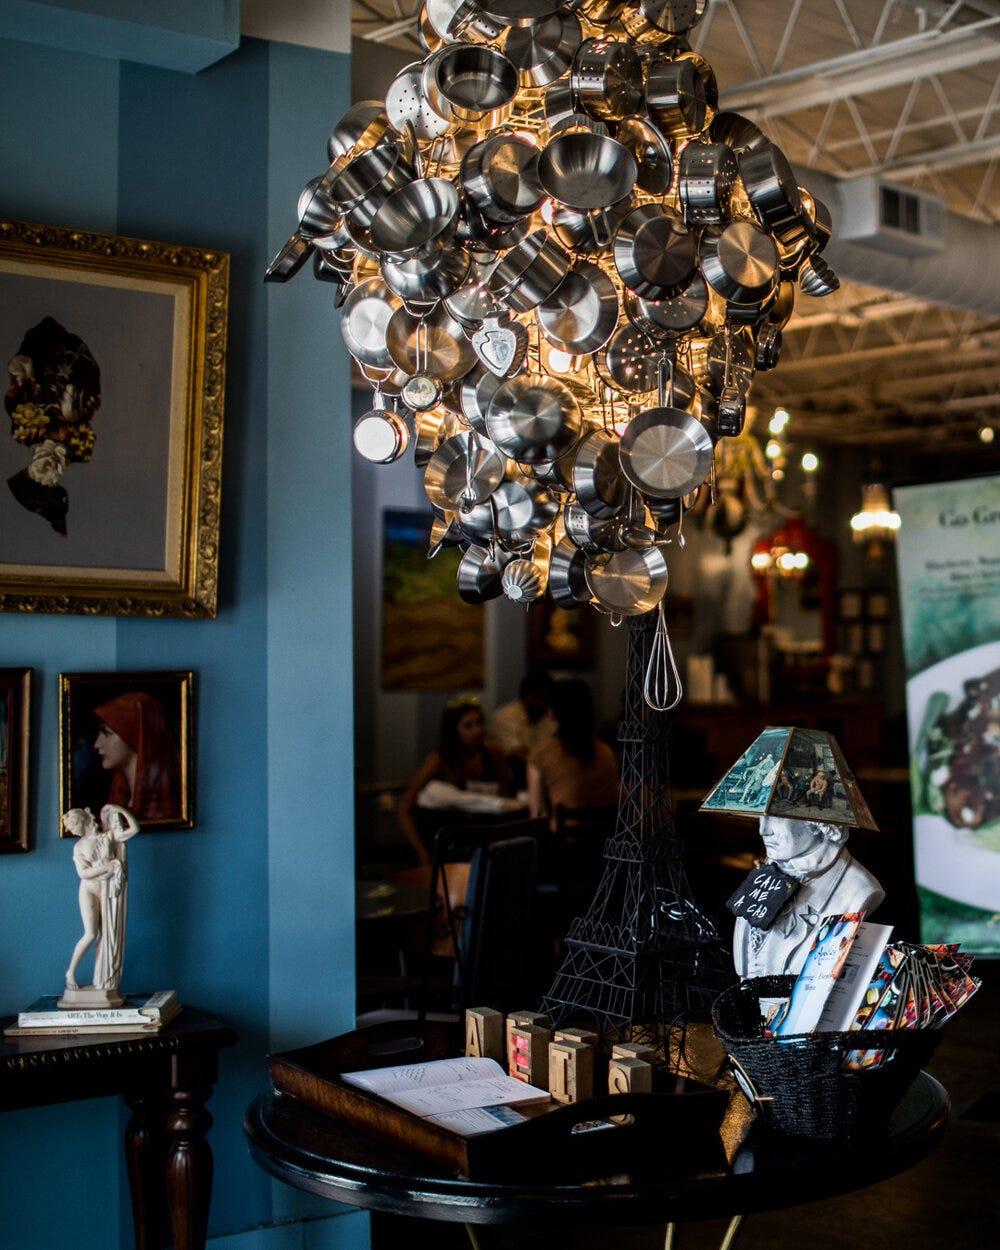 The pots & pans chandelier at Amélie's Bakery in Atlanta.